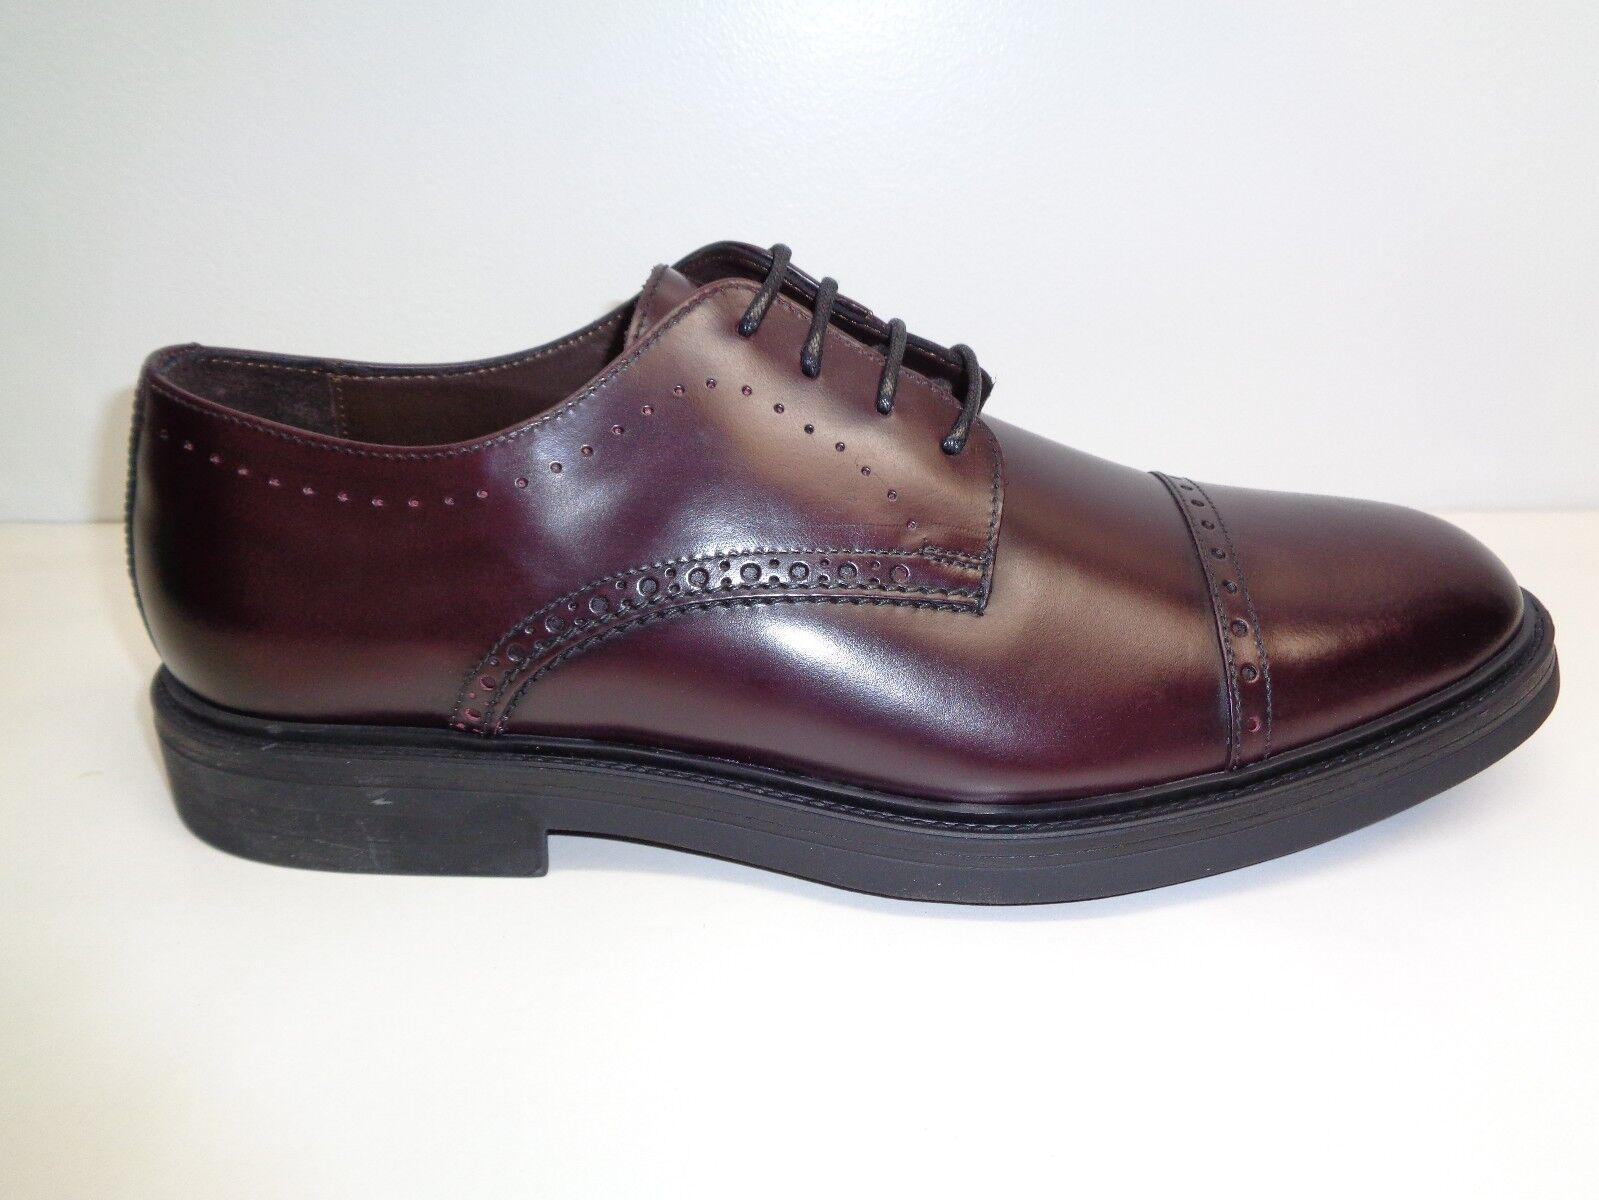 Bruno Magli Size 11 M FELICE Bordeaux Leather Cap Toe Oxfords New Mens shoes